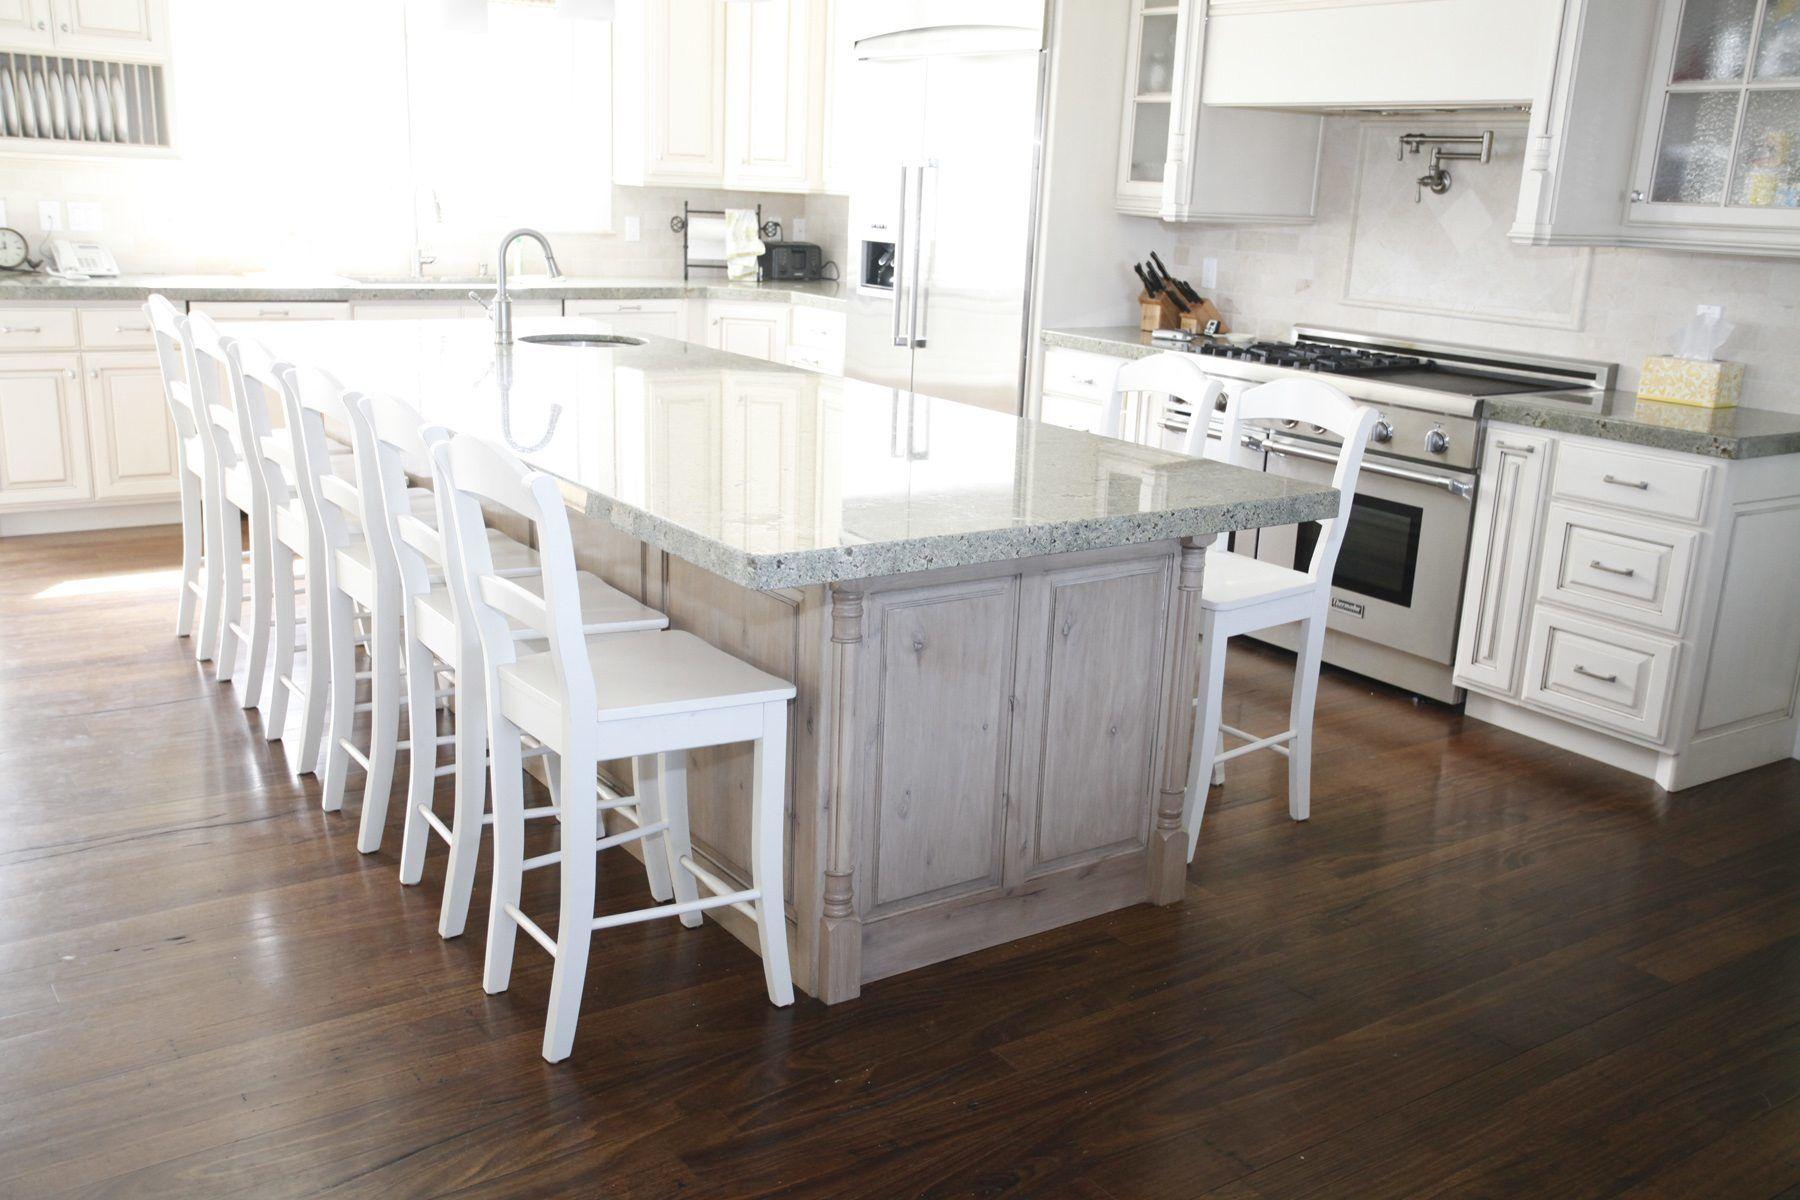 Beyaz mutfak modelleri 11 pictures to pin on pinterest - Pin Geleneksel Siyah Beyaz Mutfak On Pinterest